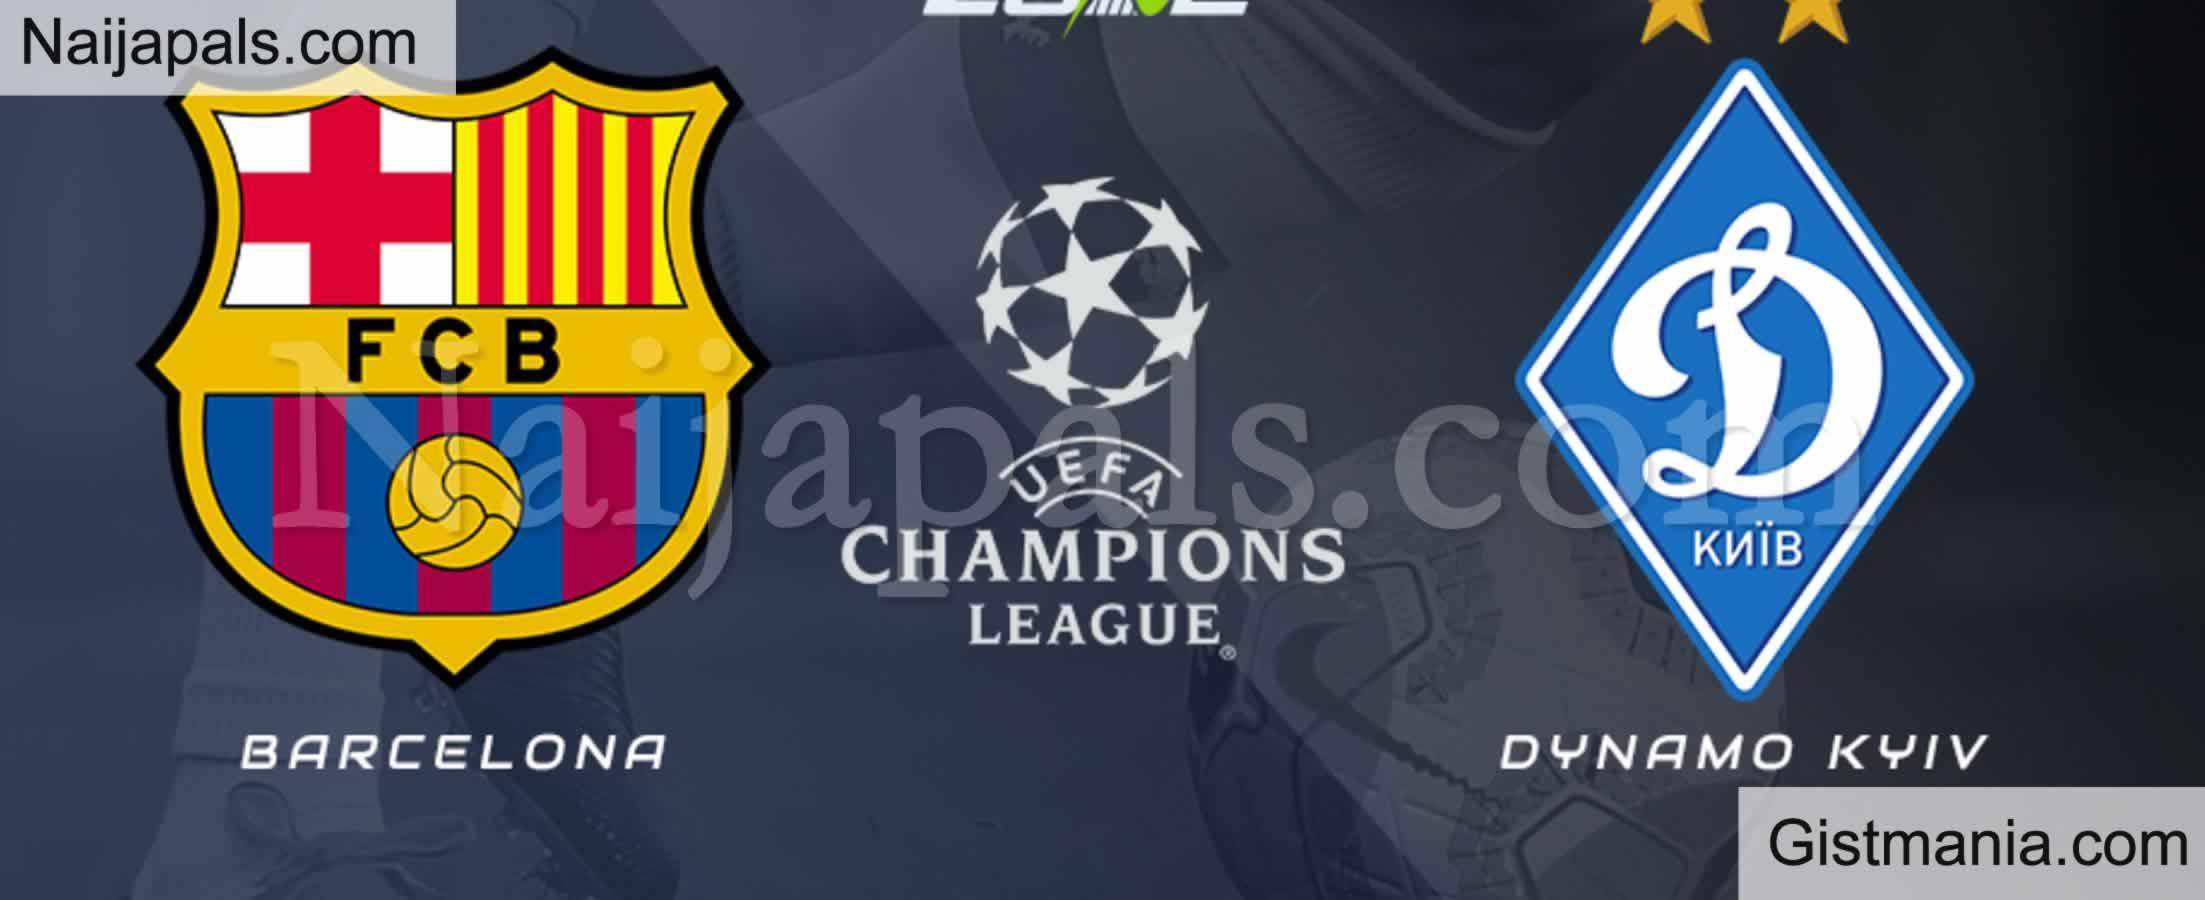 dynamo kyiv vs barcelona - photo #5